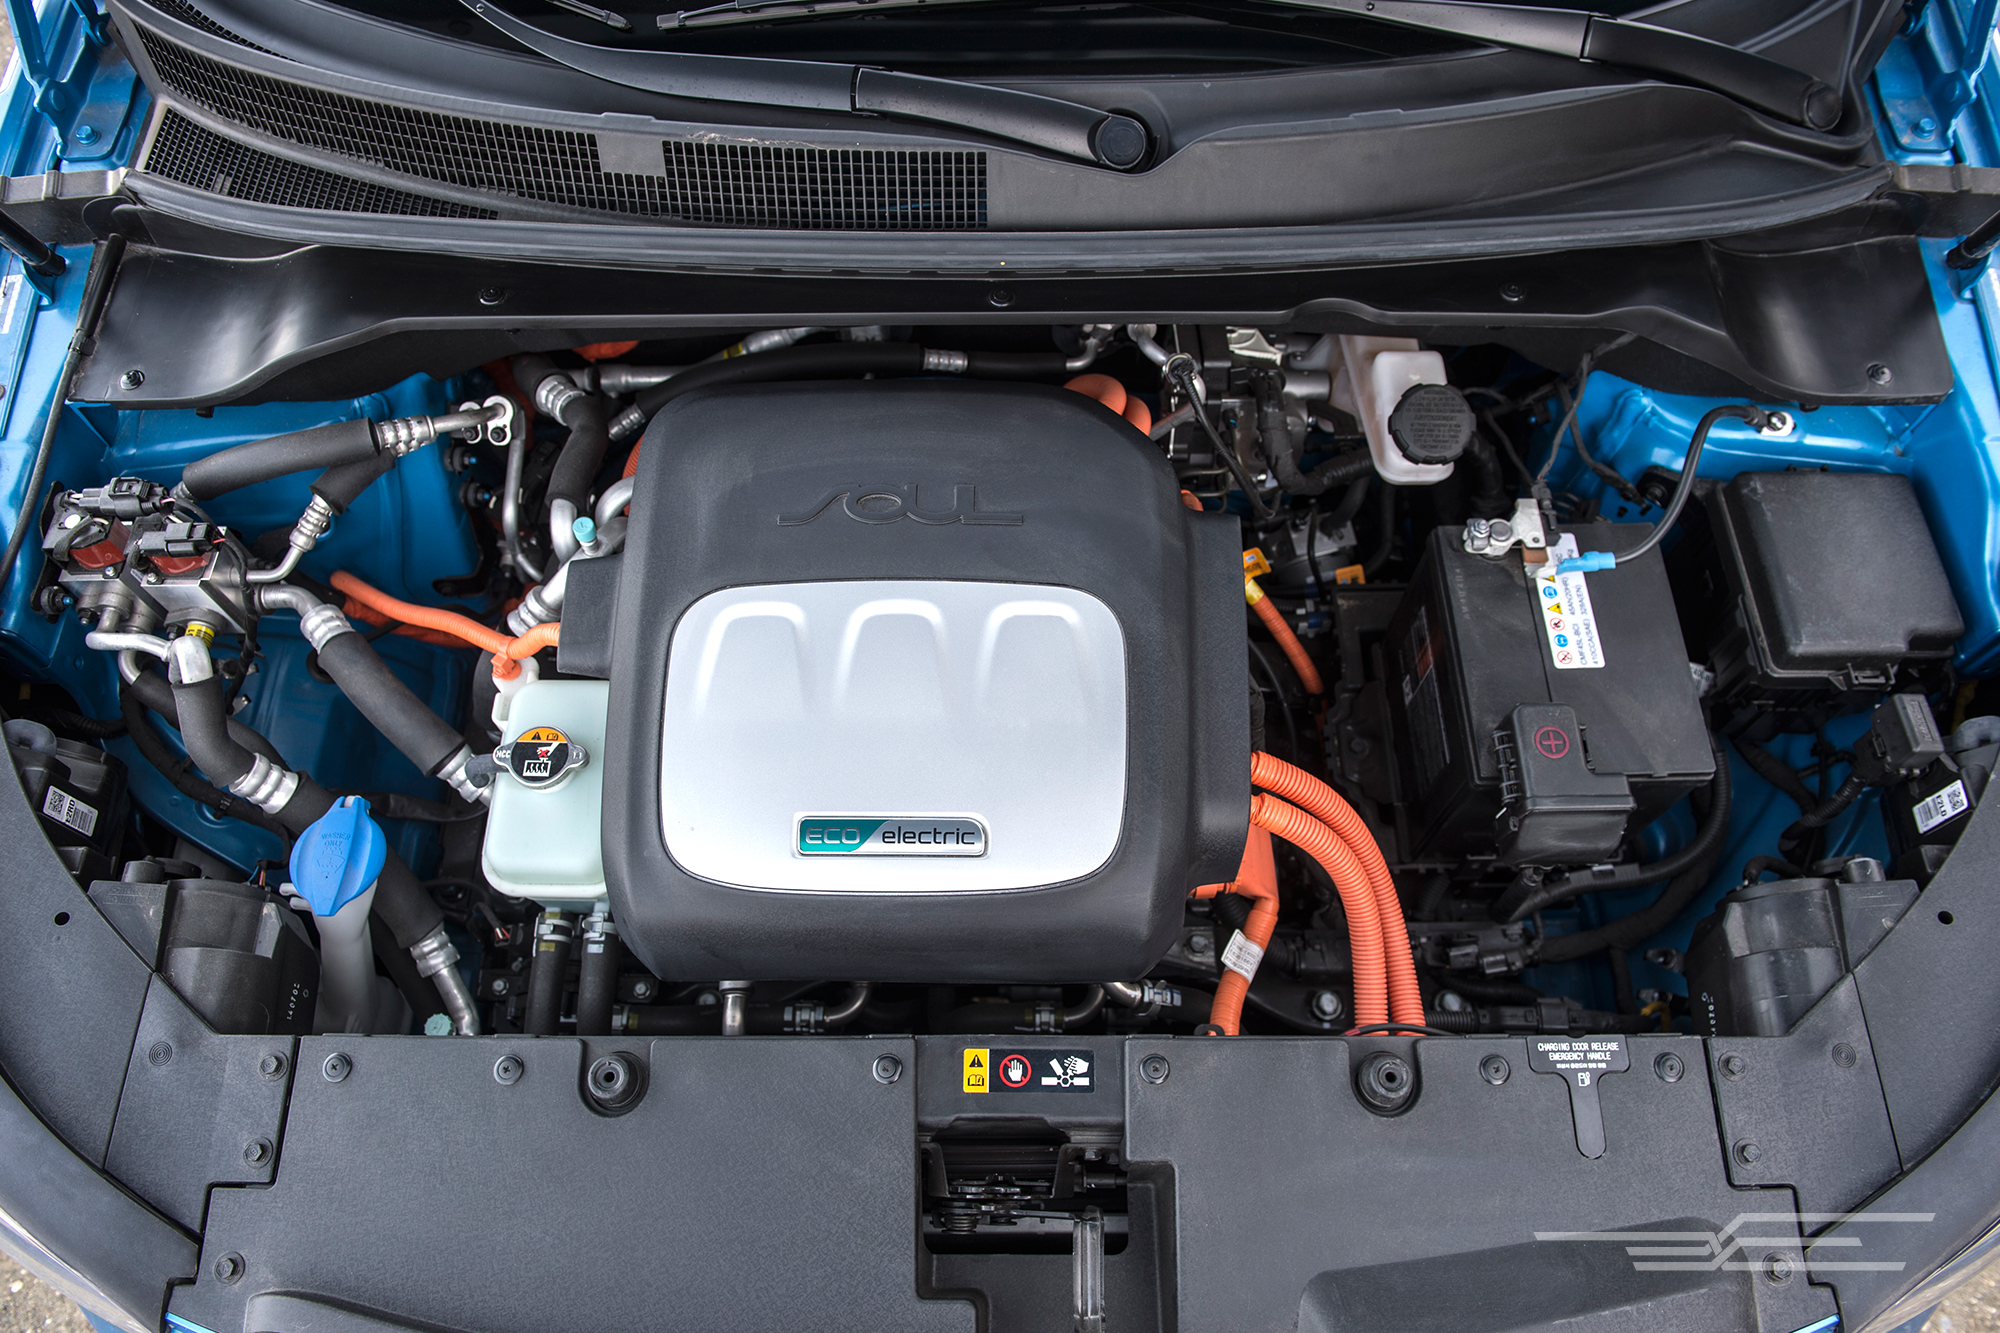 how to clean off battery acid car. Black Bedroom Furniture Sets. Home Design Ideas